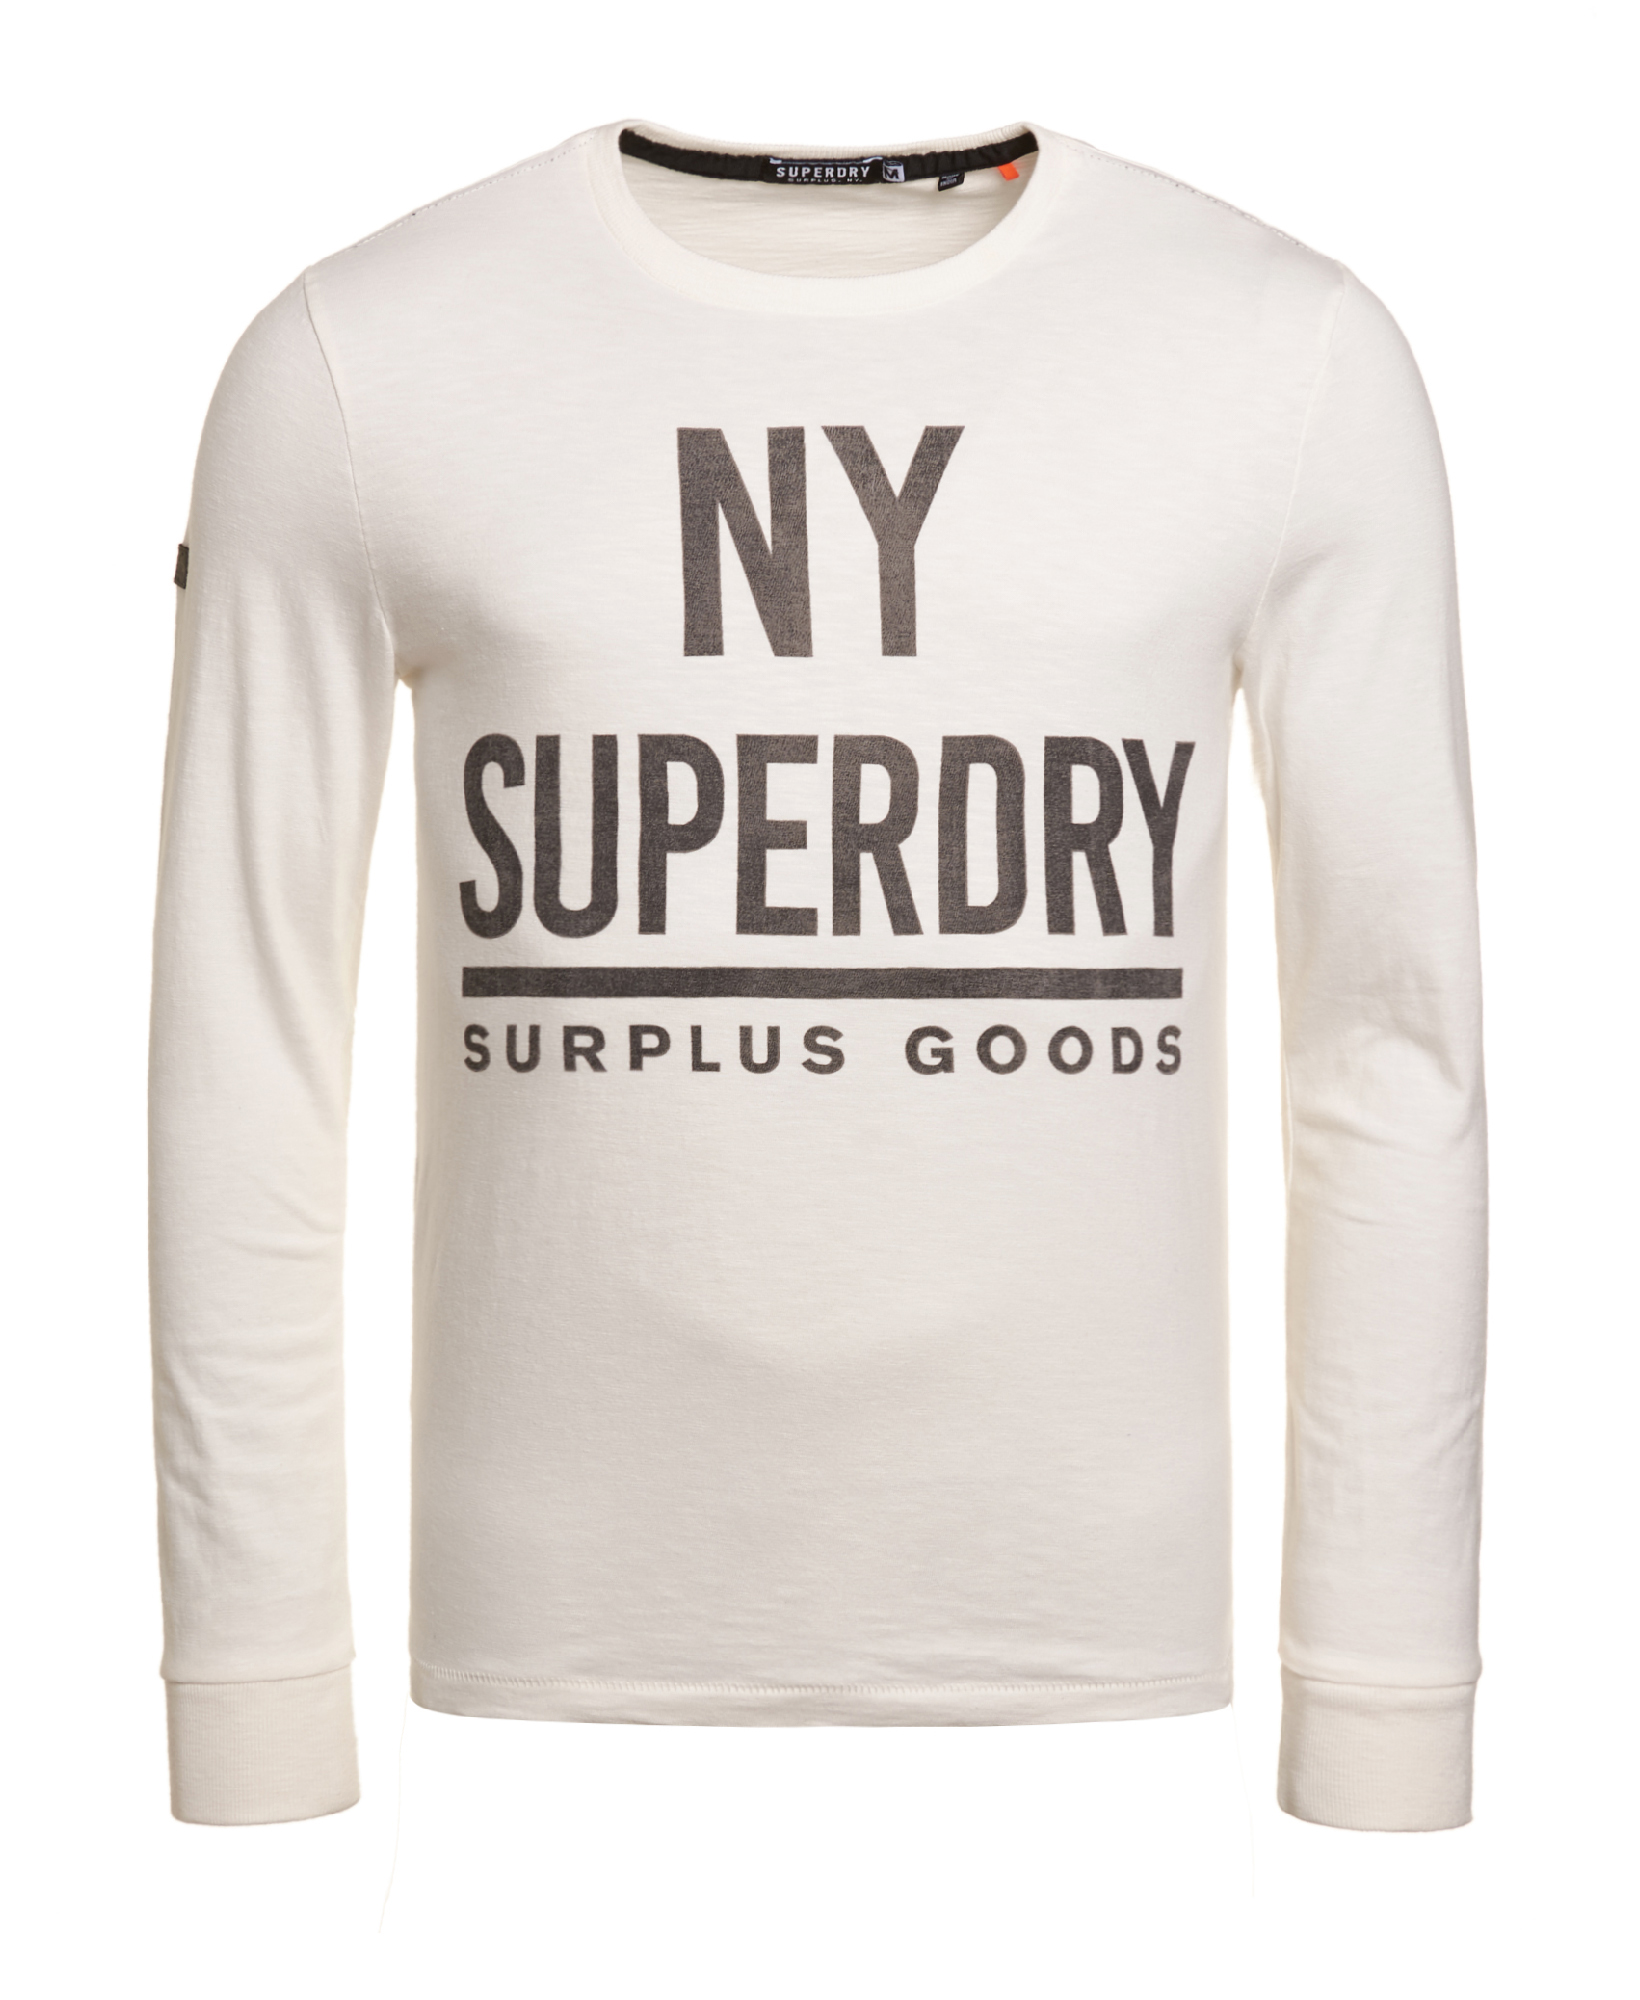 f5bf5bbd Sentinel New Mens Superdry Surplus Goods Graphic T-Shirt Tribeca White